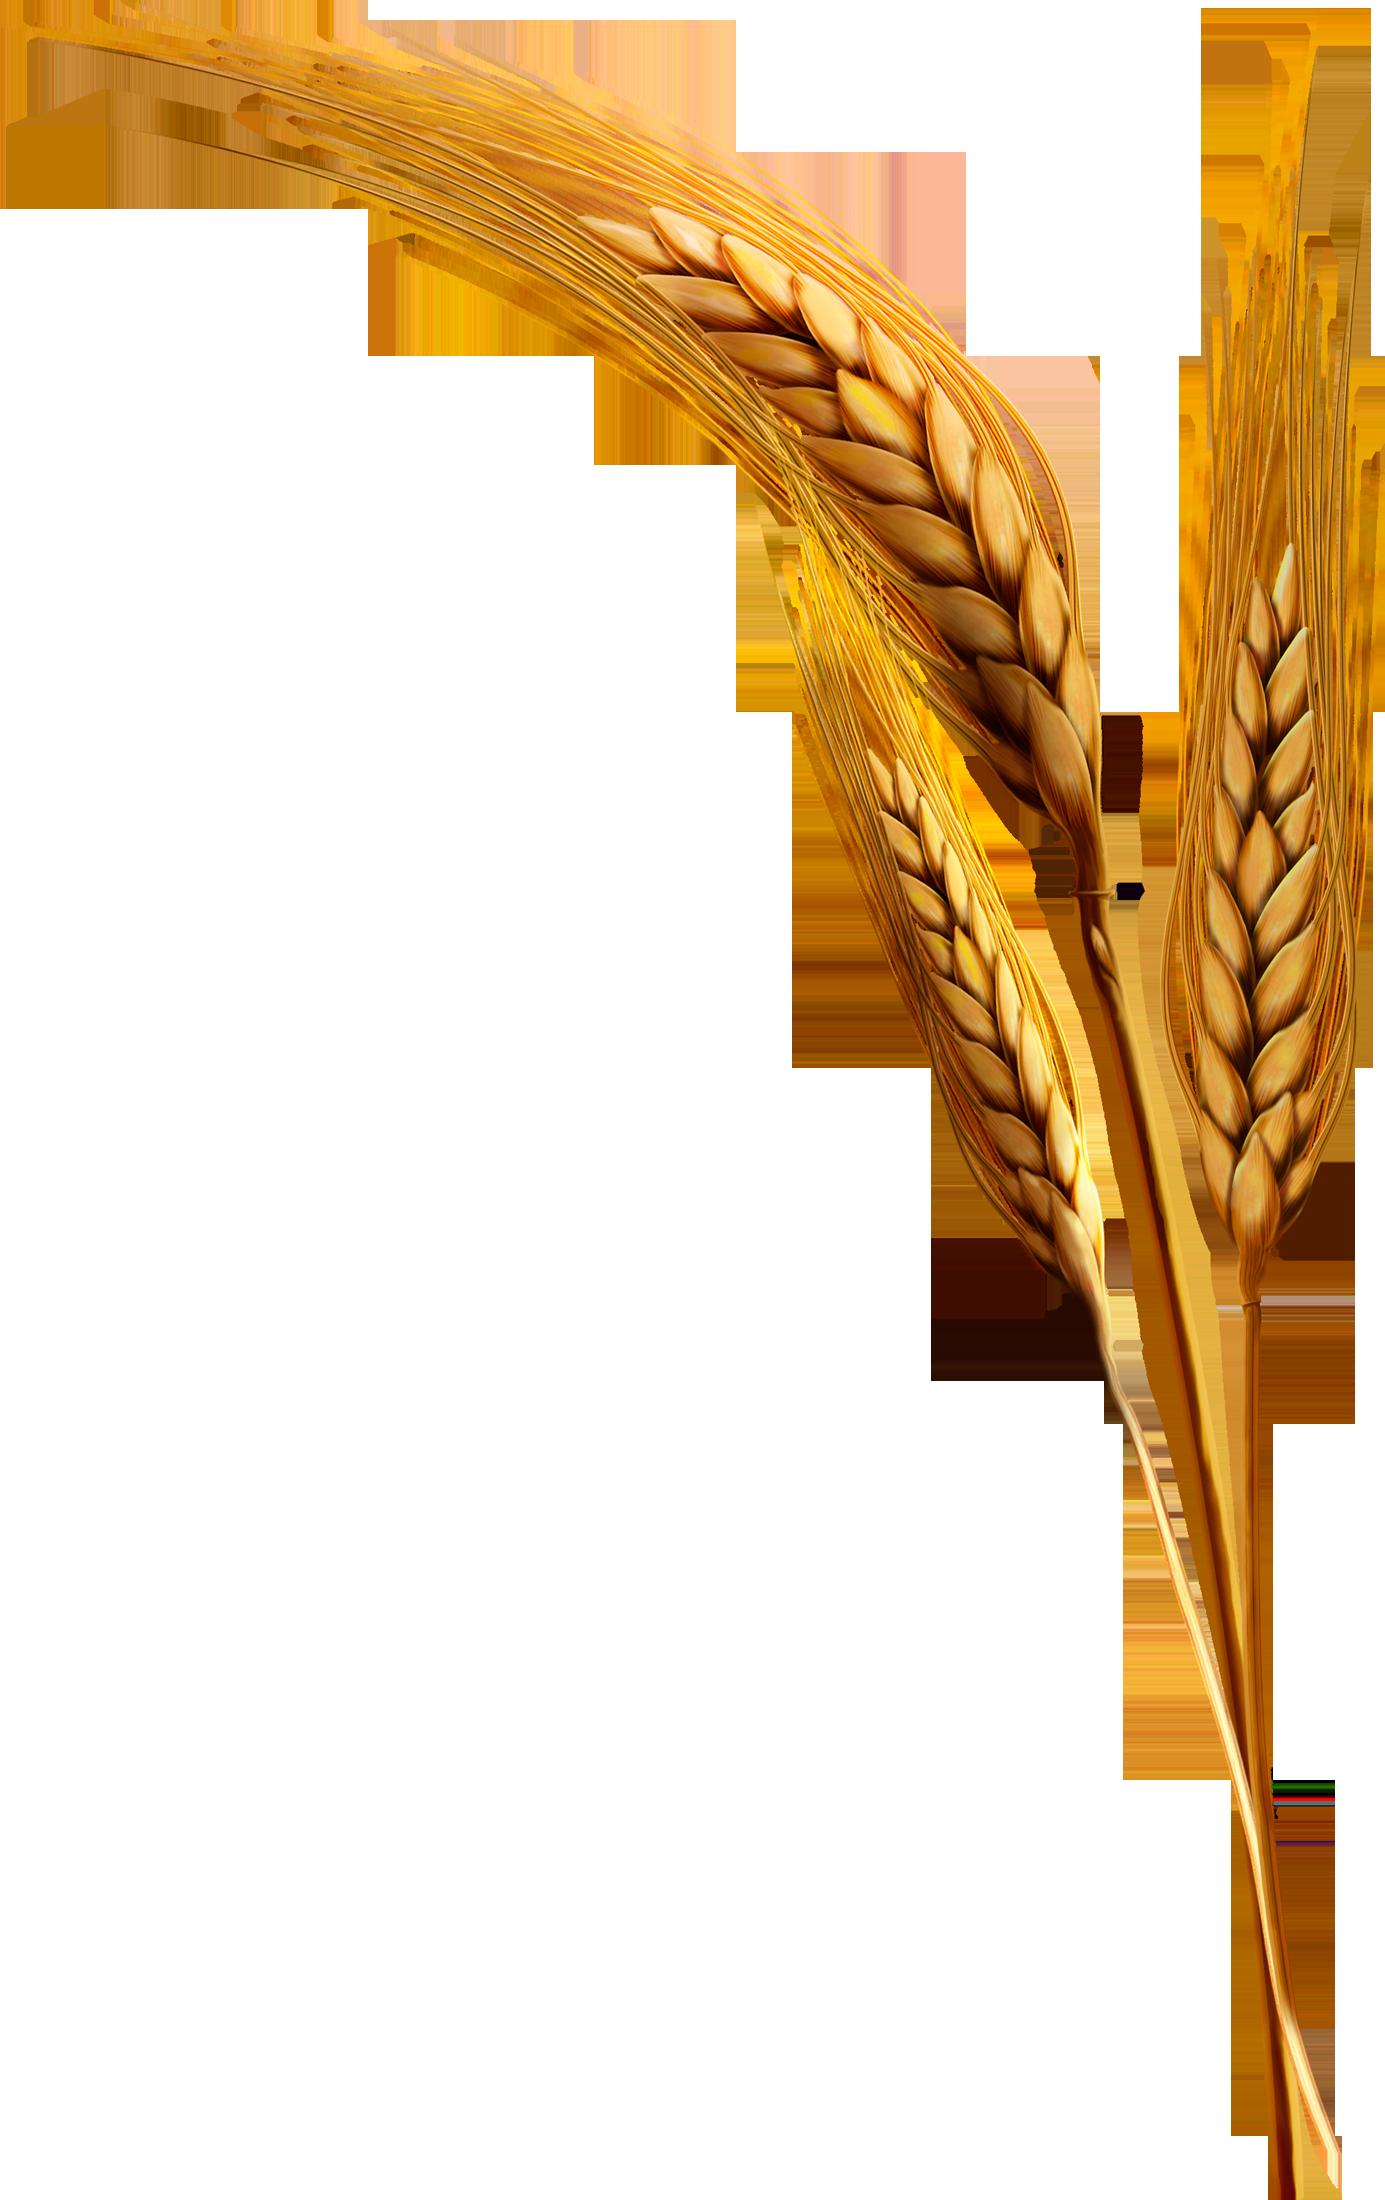 Emmer rice clip art. Wheat clipart grain bag